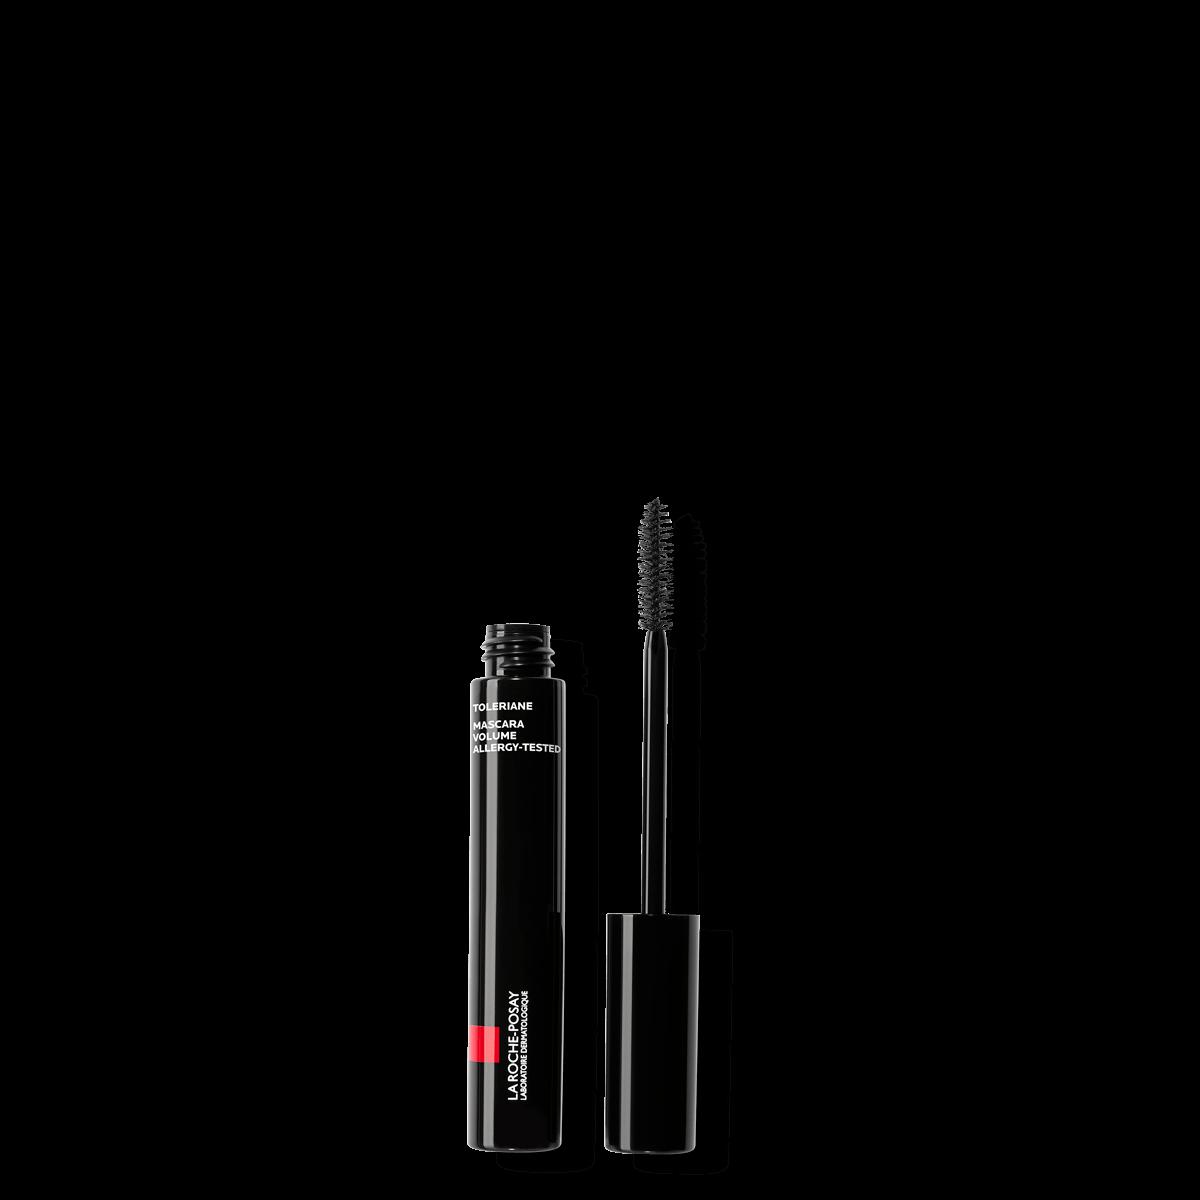 La Roche Posay Herkkä Toleriane Make up VOLUME MASCARA Brown 333787